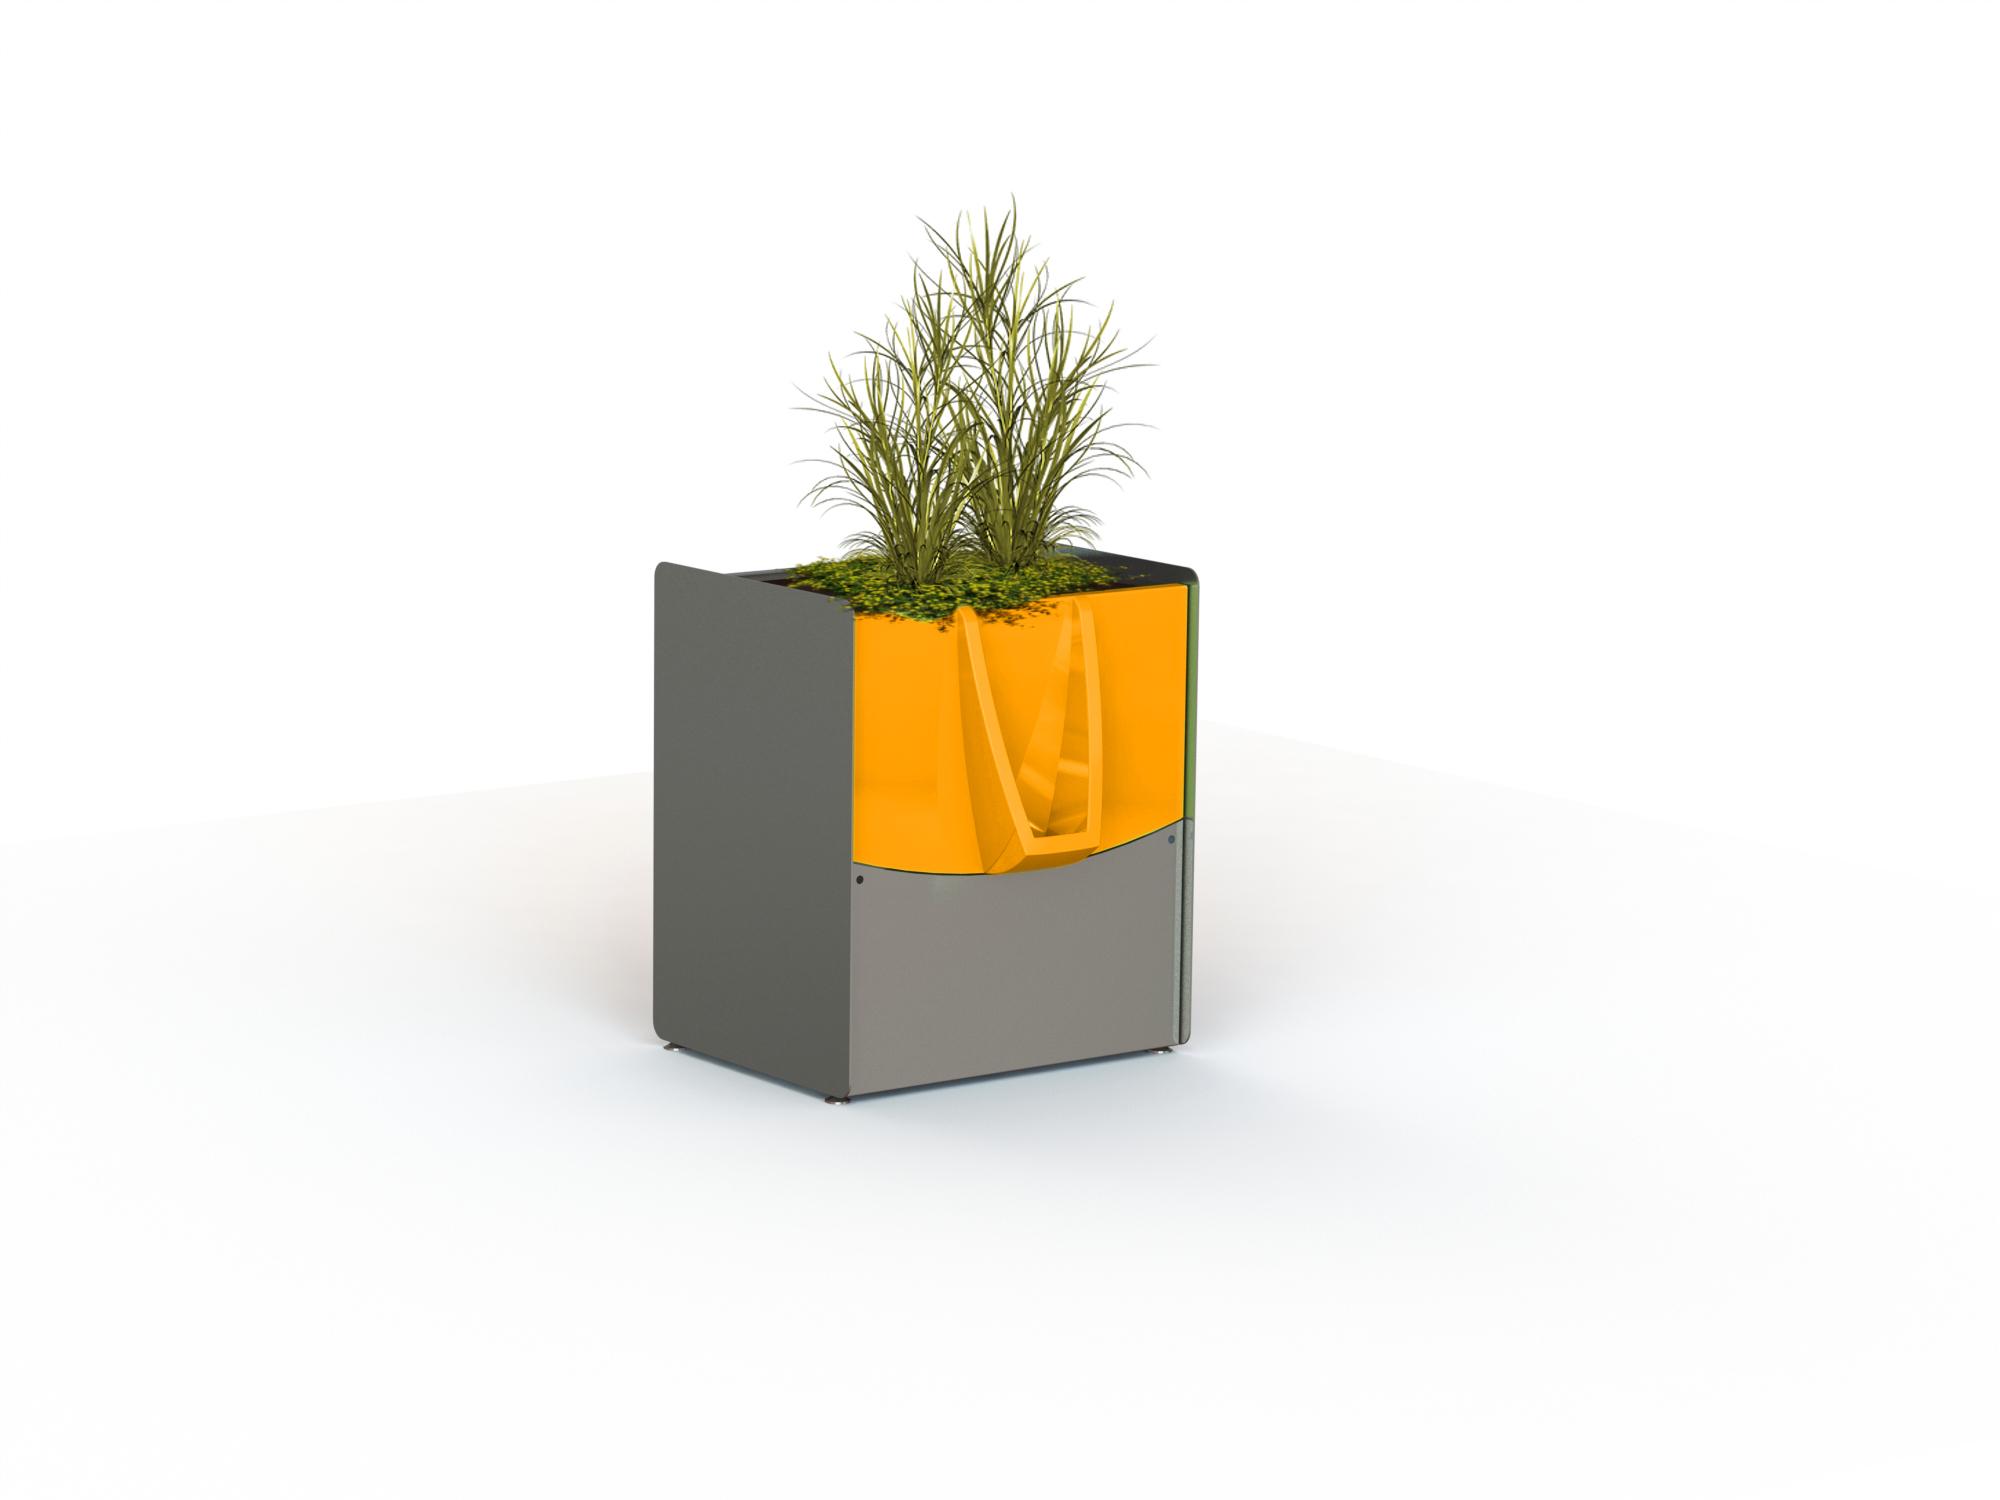 https://greenpee.nl/wp-content/uploads/2018/07/foto-stap-2-1.jpg